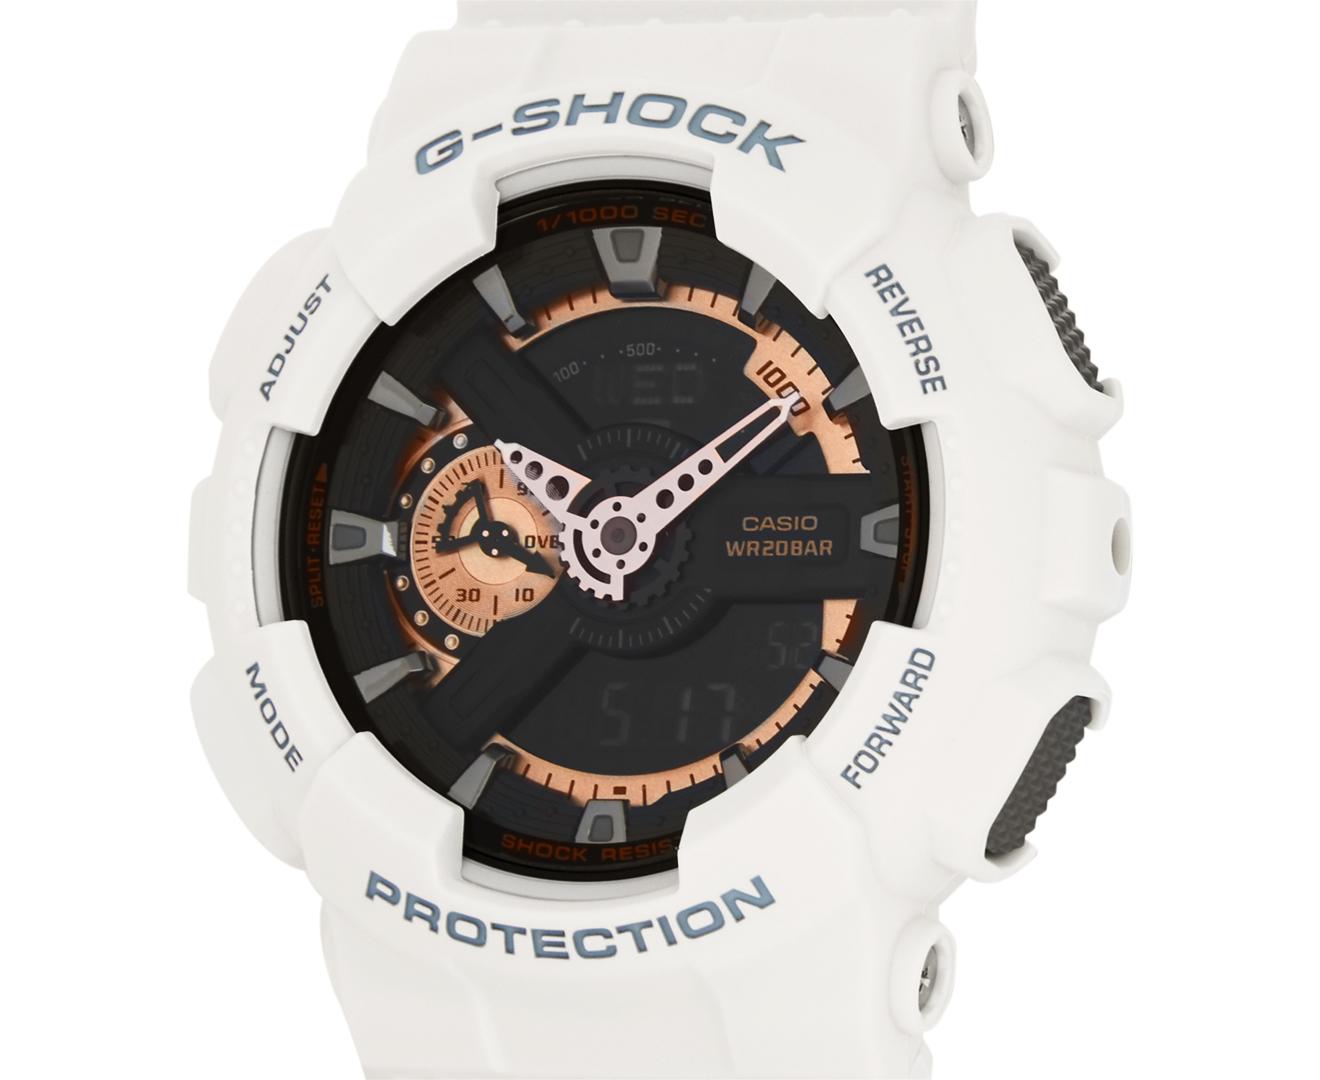 Casio G-Shock Men's 55mm GA110RG-7A Duo Watch - White/Black/Rose Gold | Scoopon Shopping